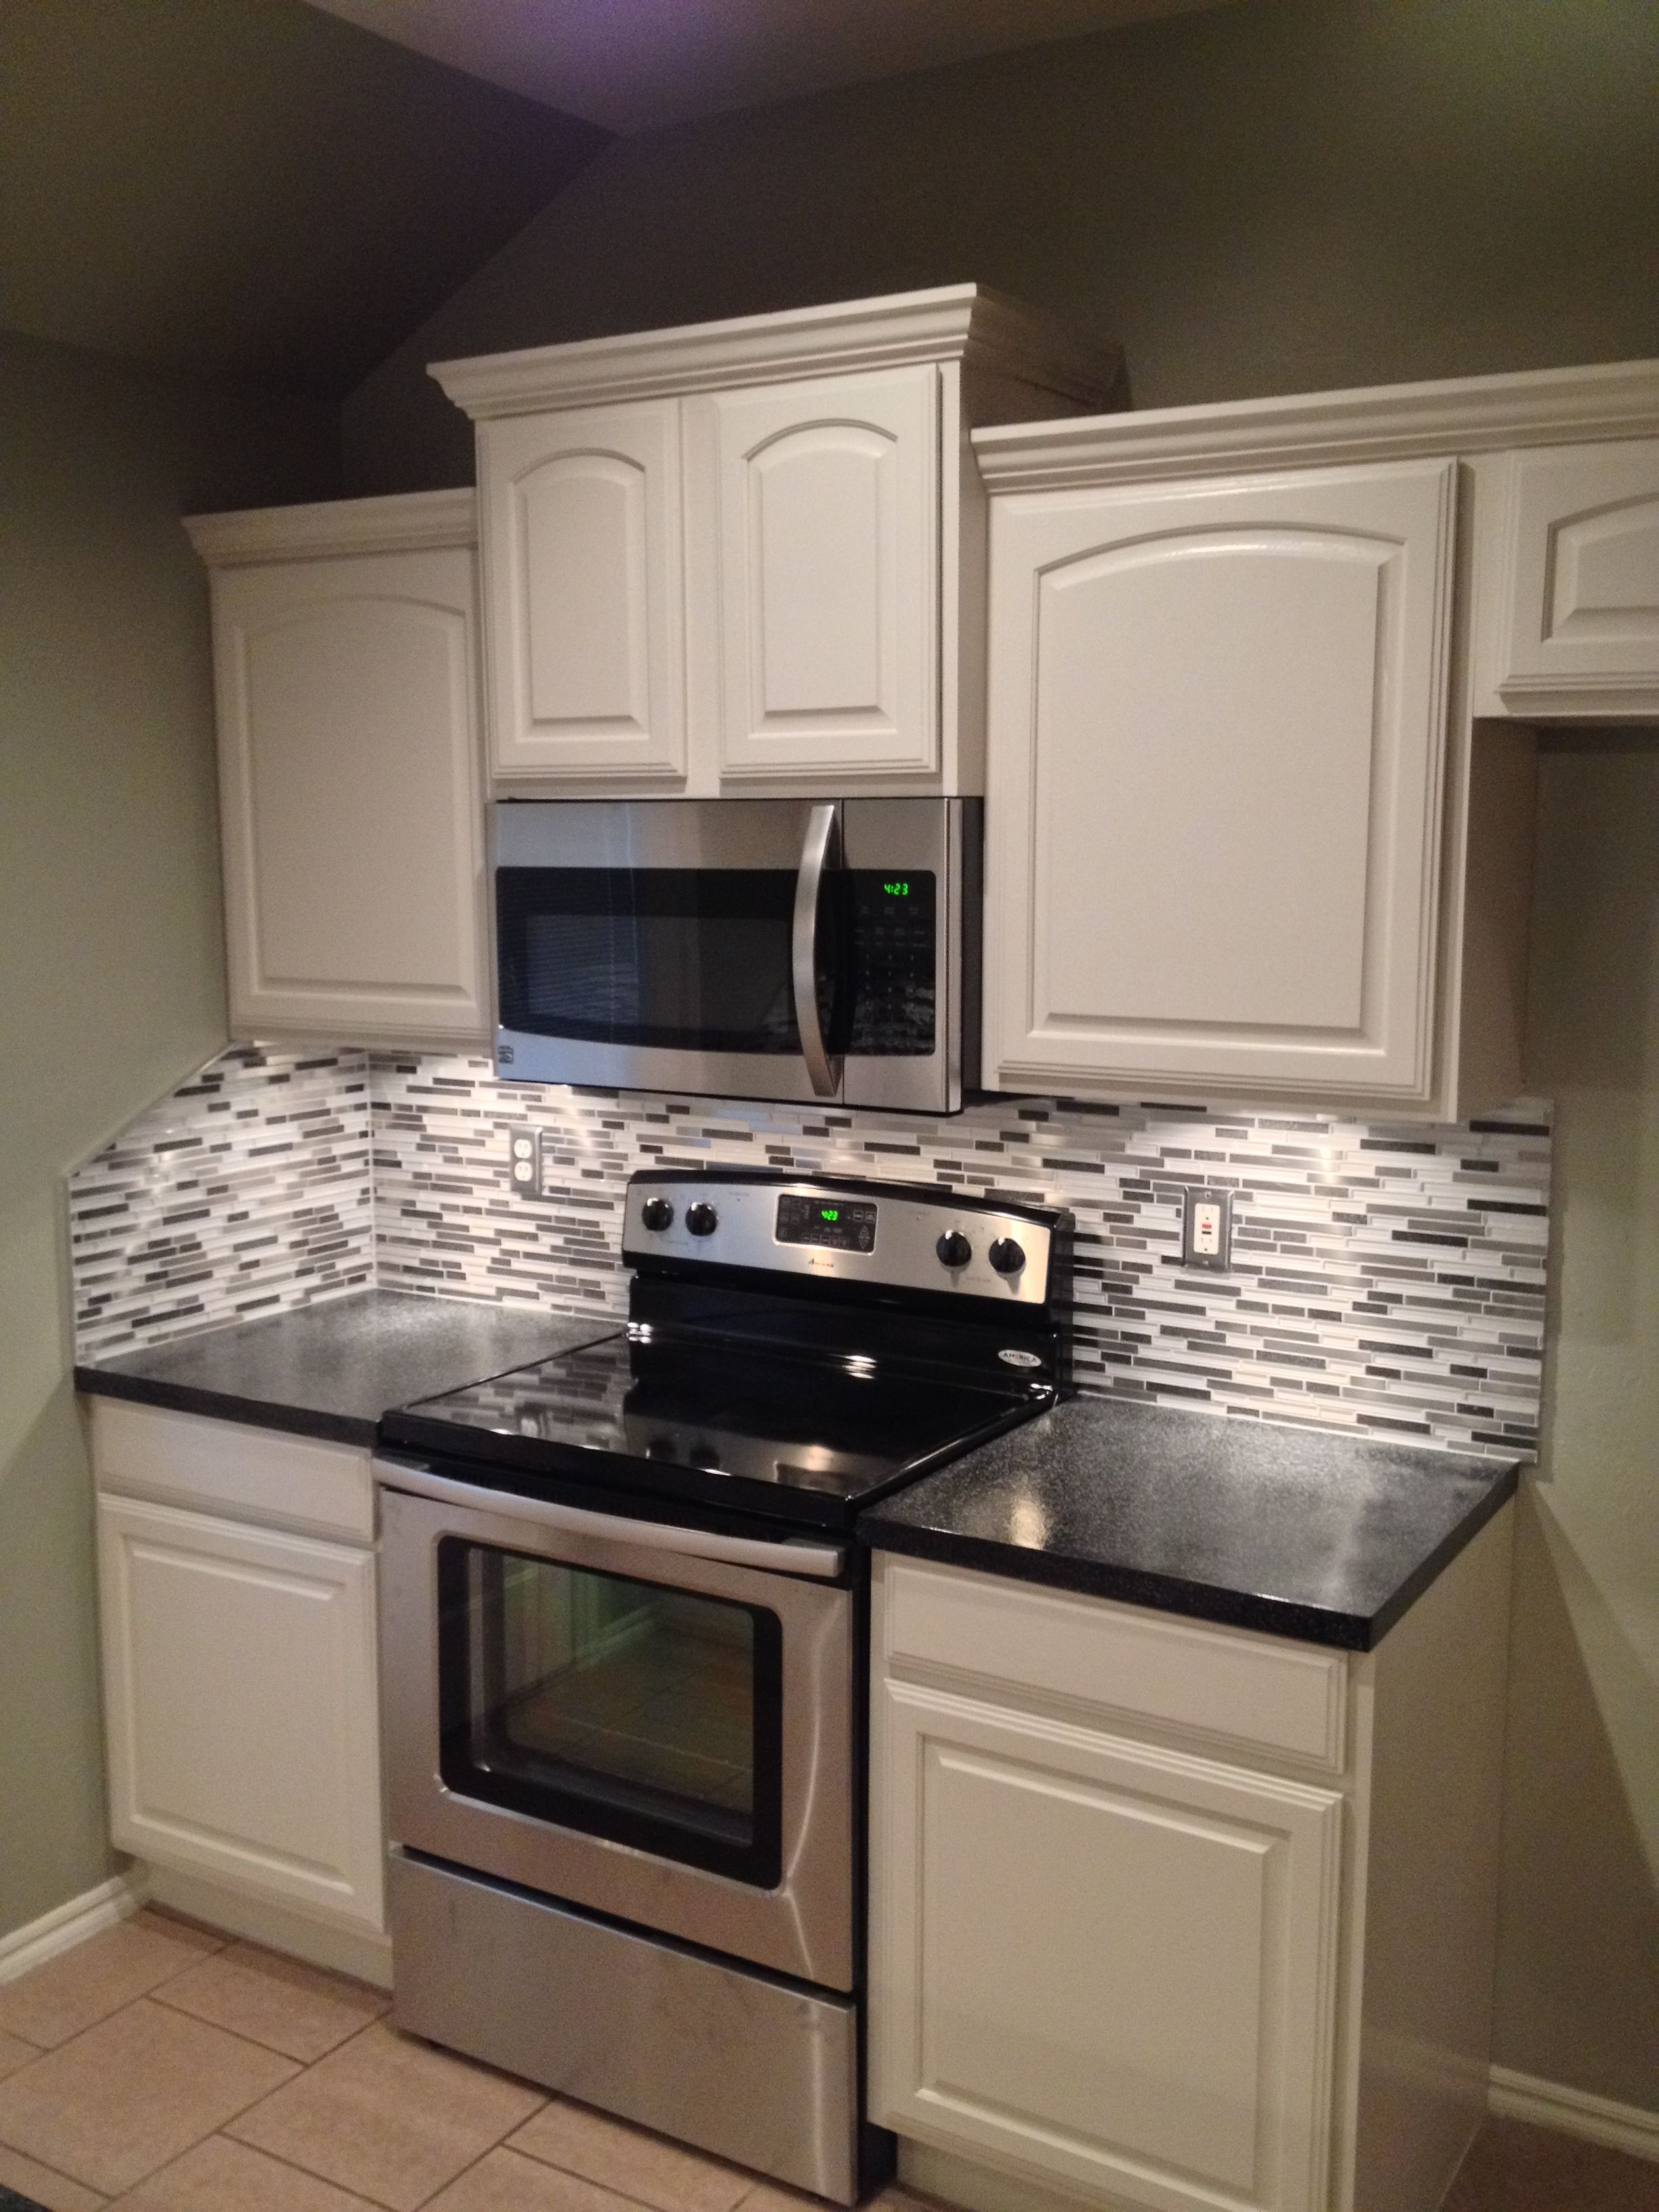 Oklahoma city u edmond showers and backsplash painted kitchen